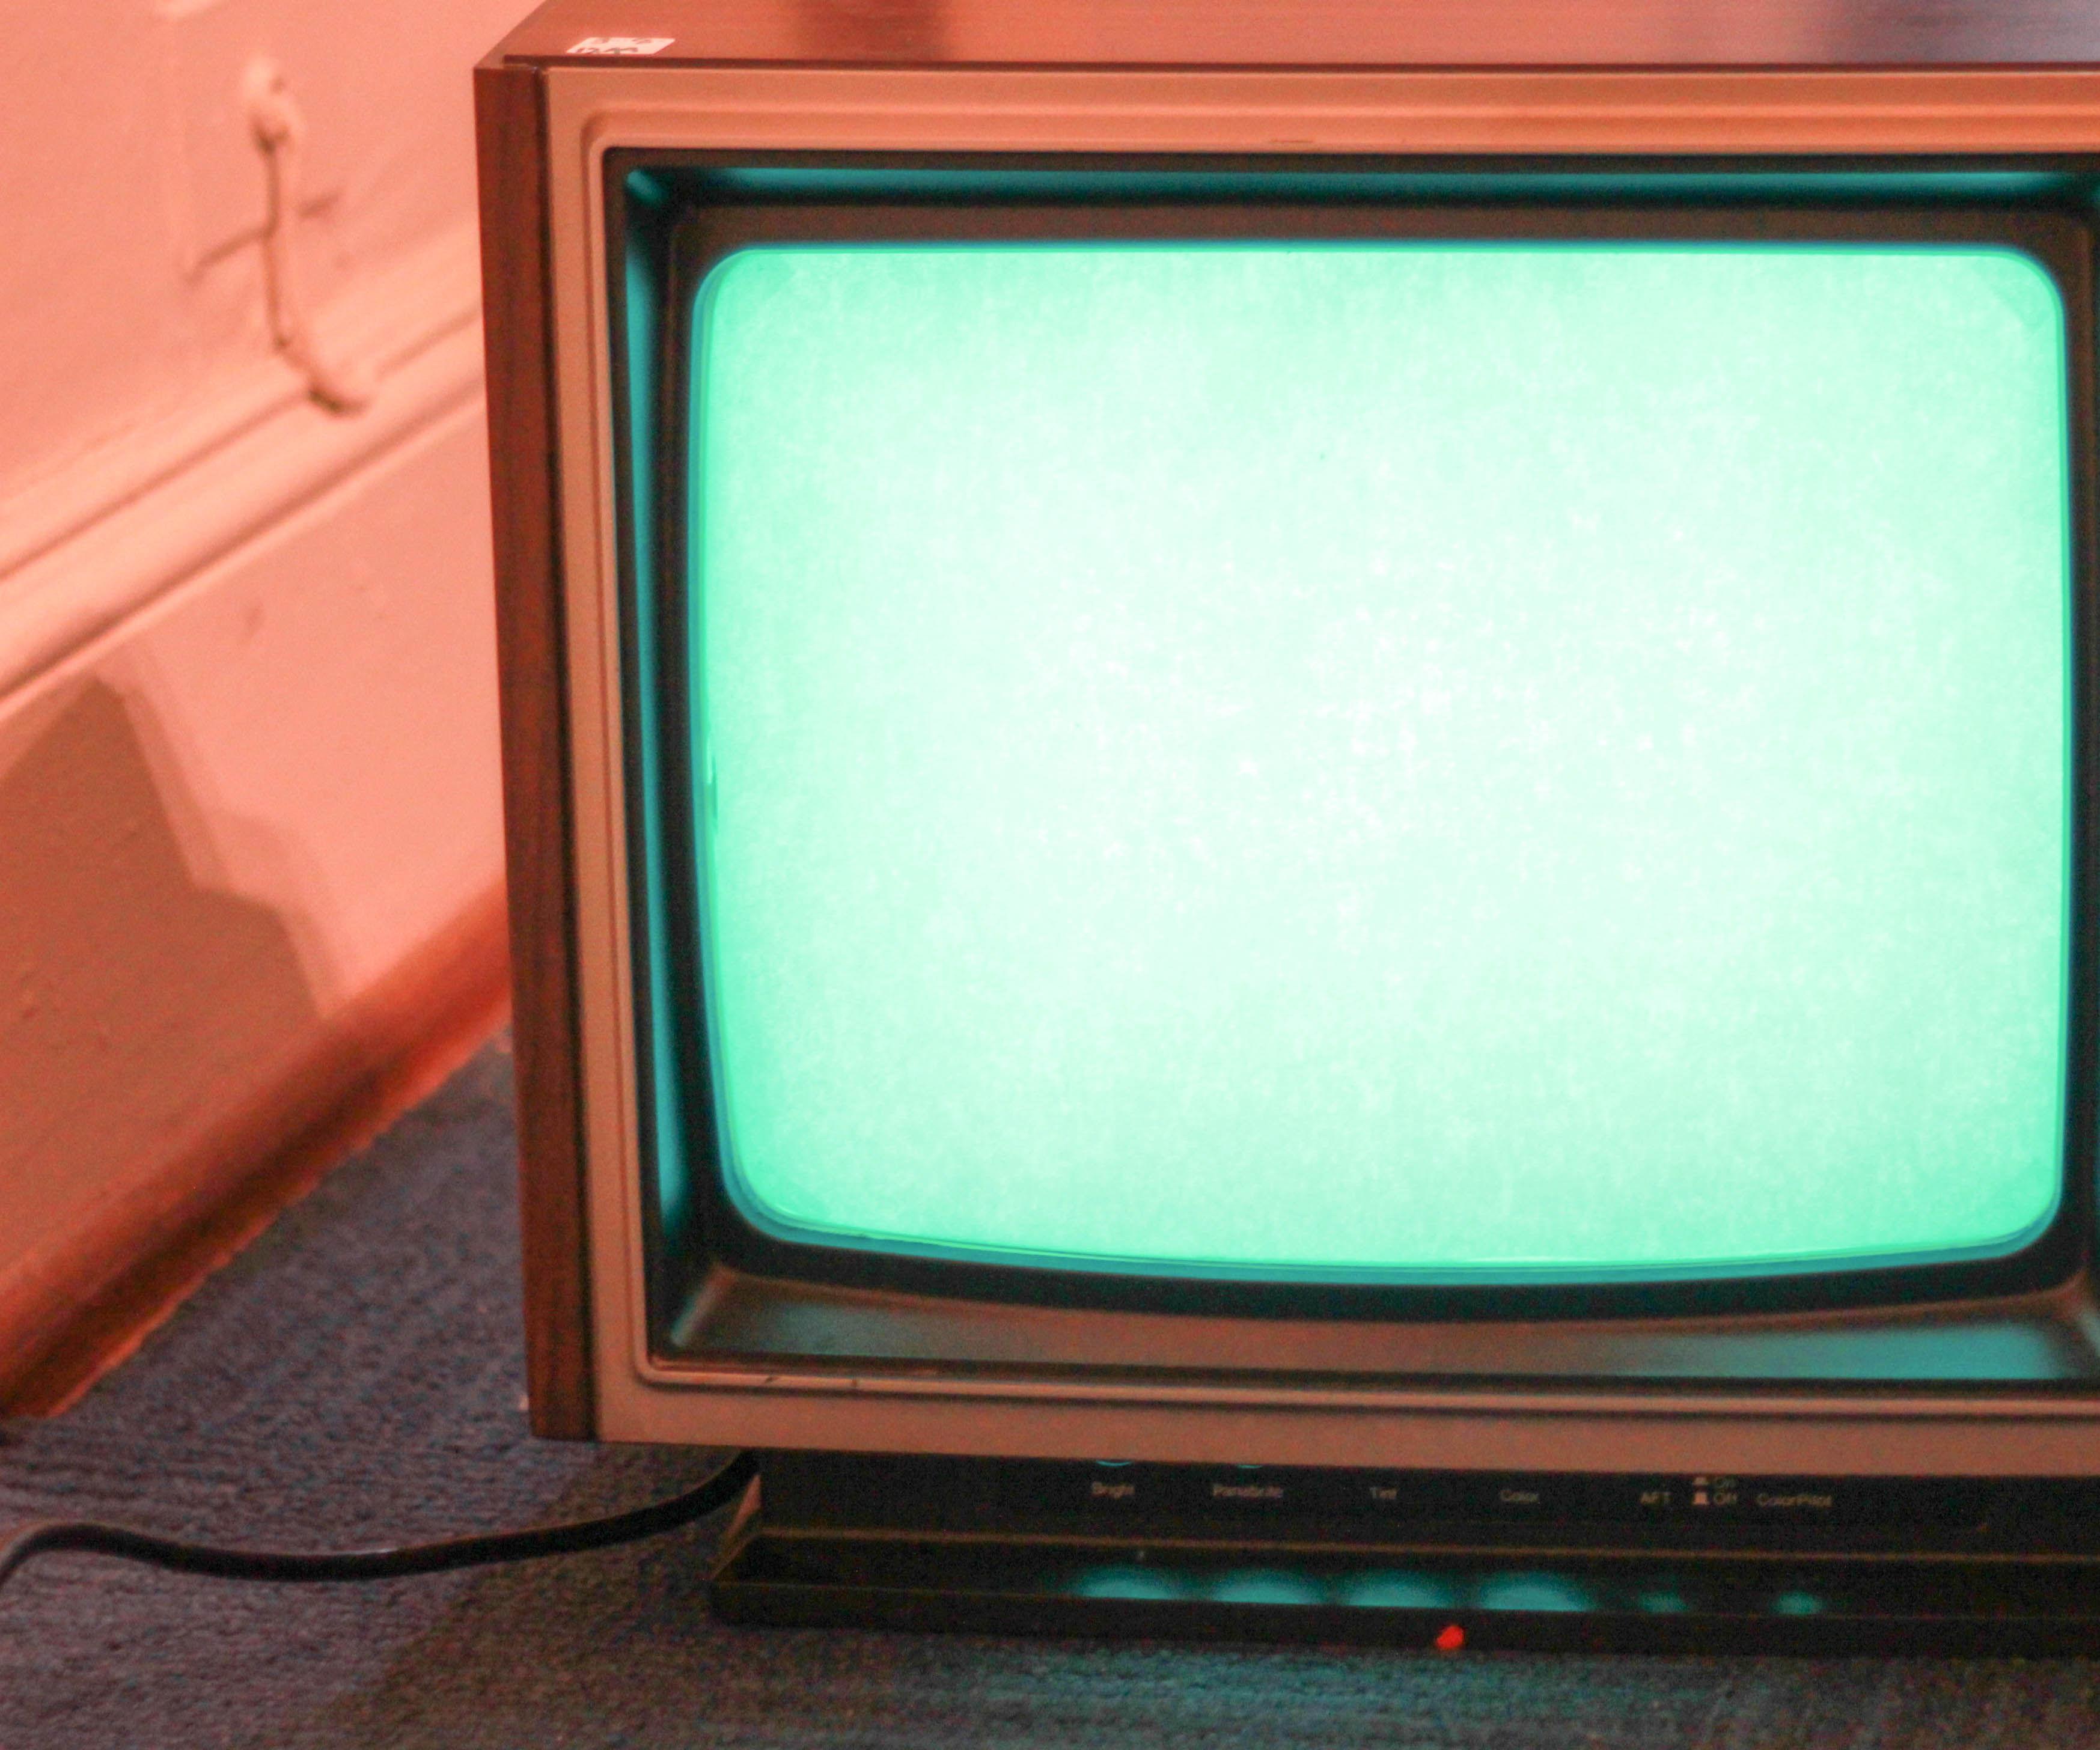 TV Glow